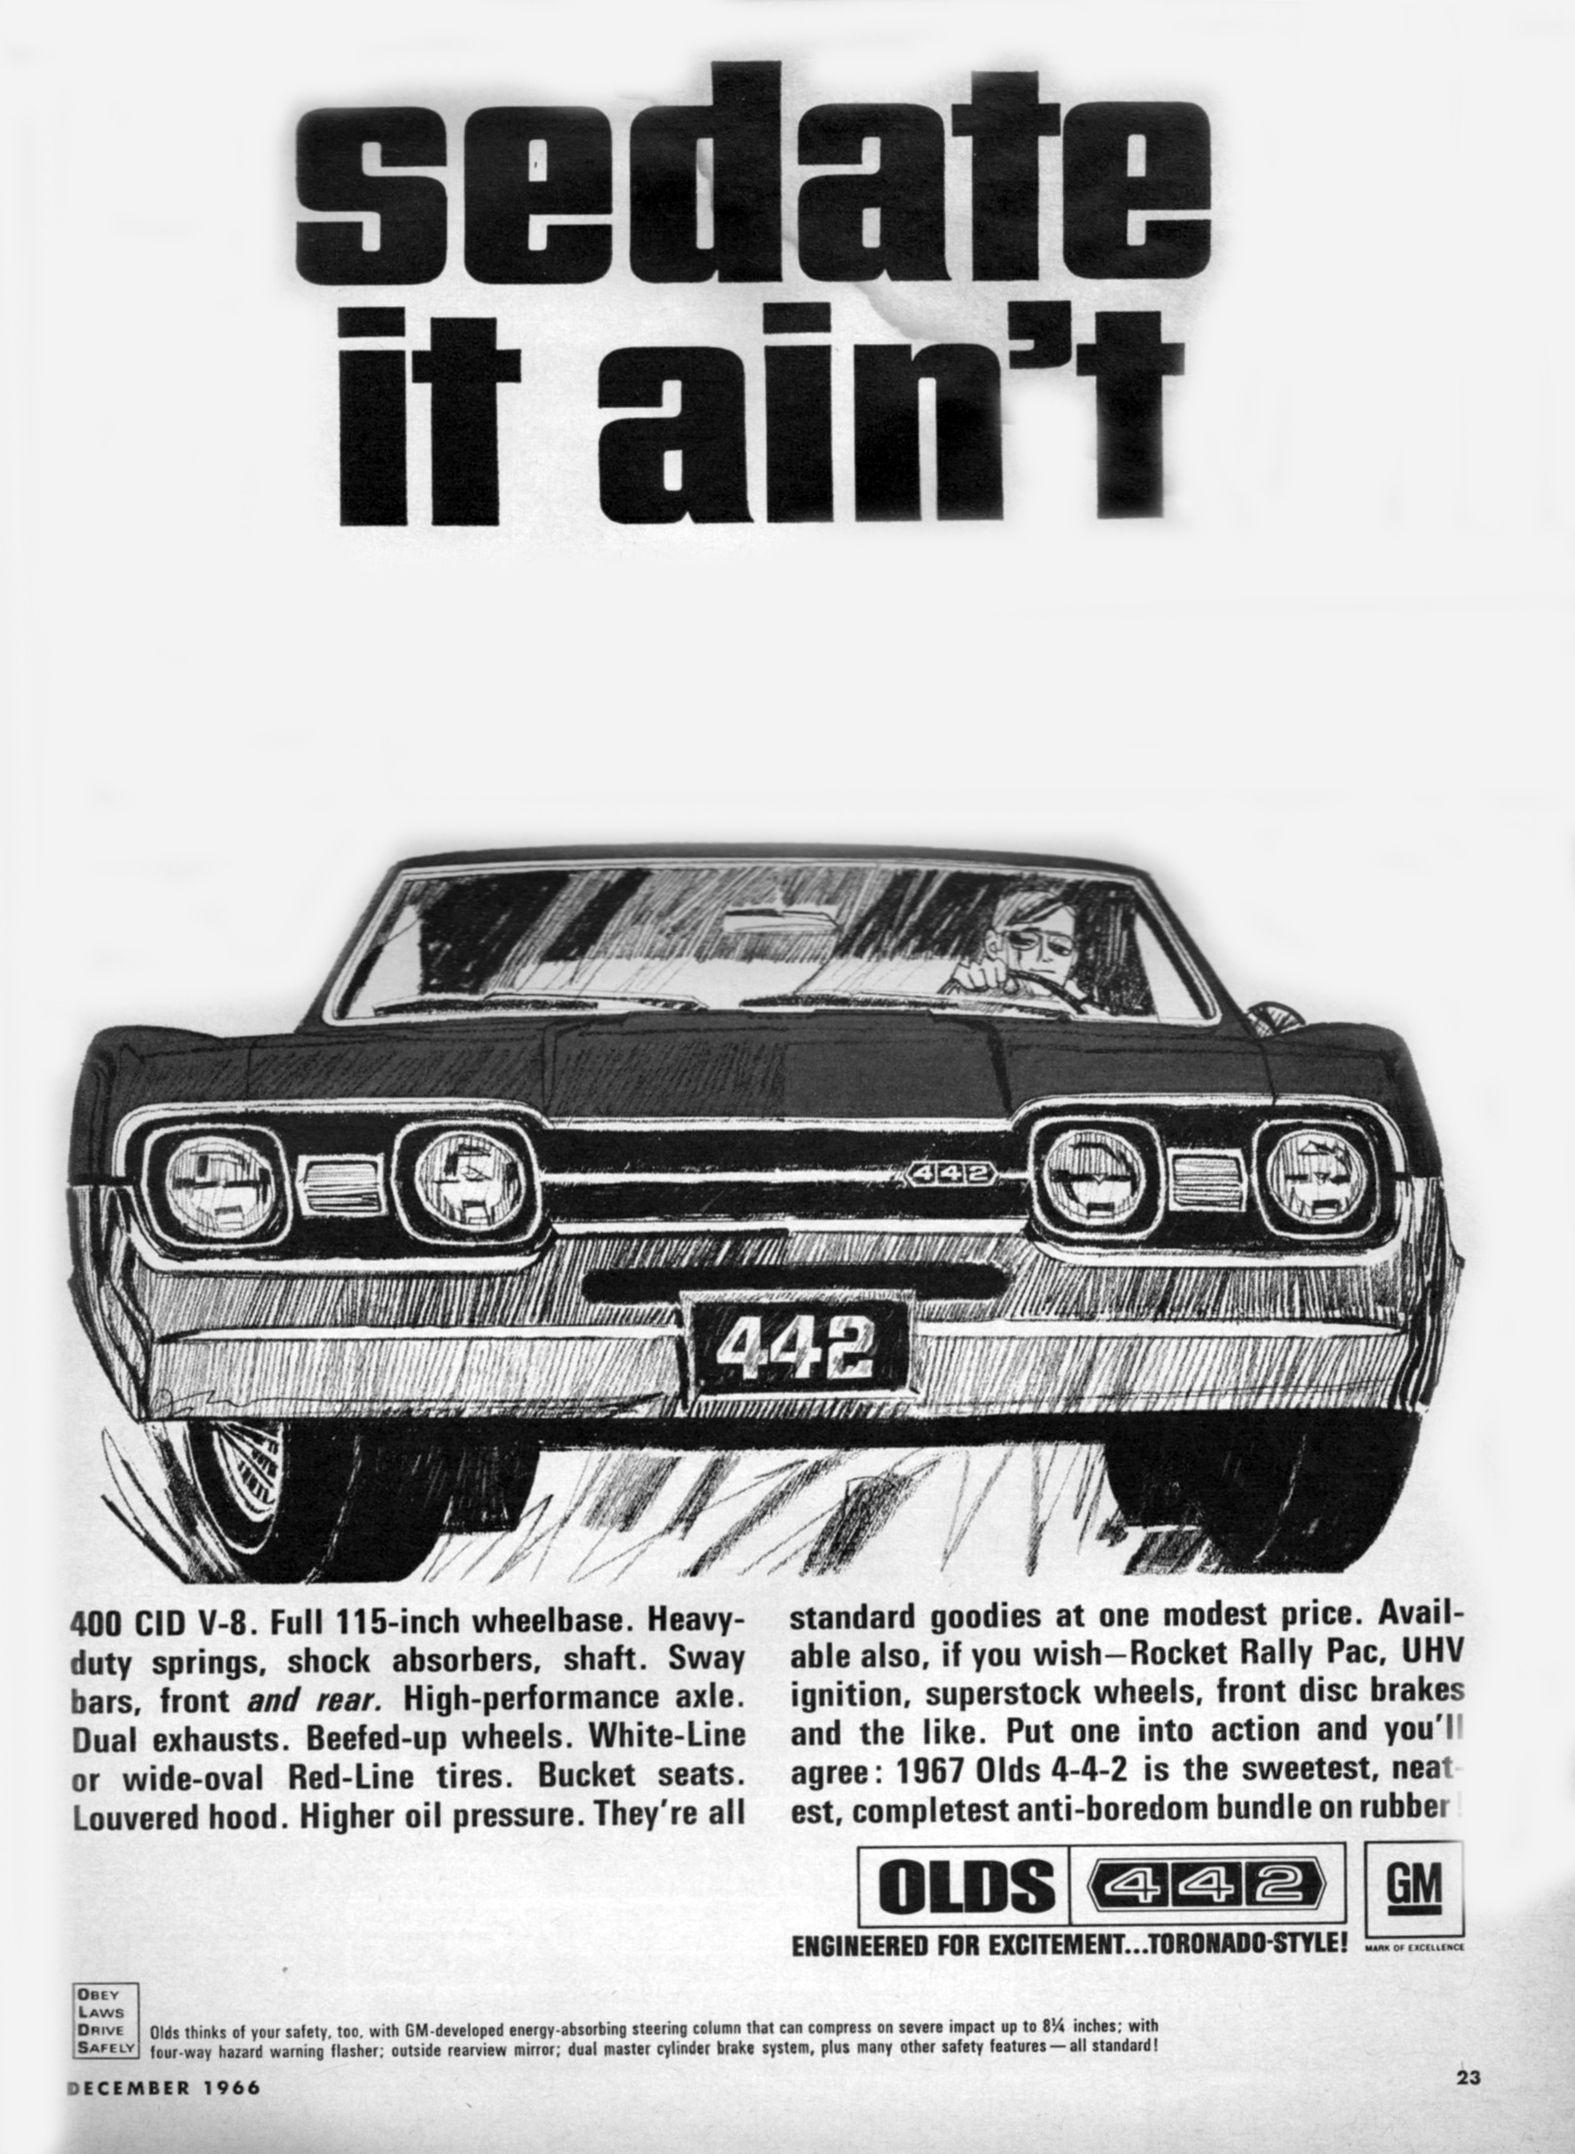 olds 442 ad 1966 67 [ 1575 x 2154 Pixel ]